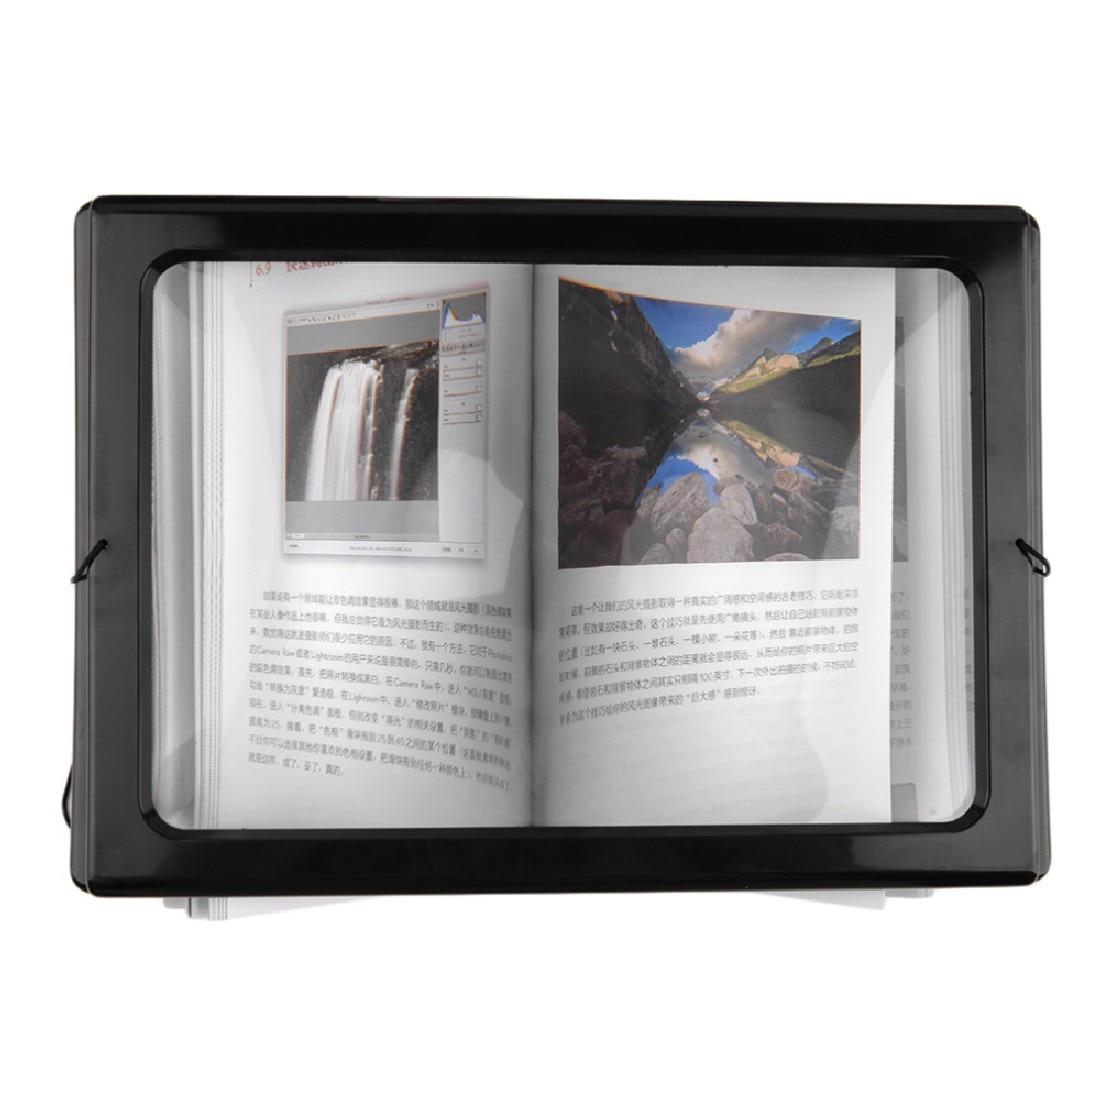 1pc A4 صفحه کامل ذره بین 3X بزرگ غول میز بزرگ ذره بین تاشو بزرگنمایی برای خواندن بافندگی دوخت با 4 چراغ LED